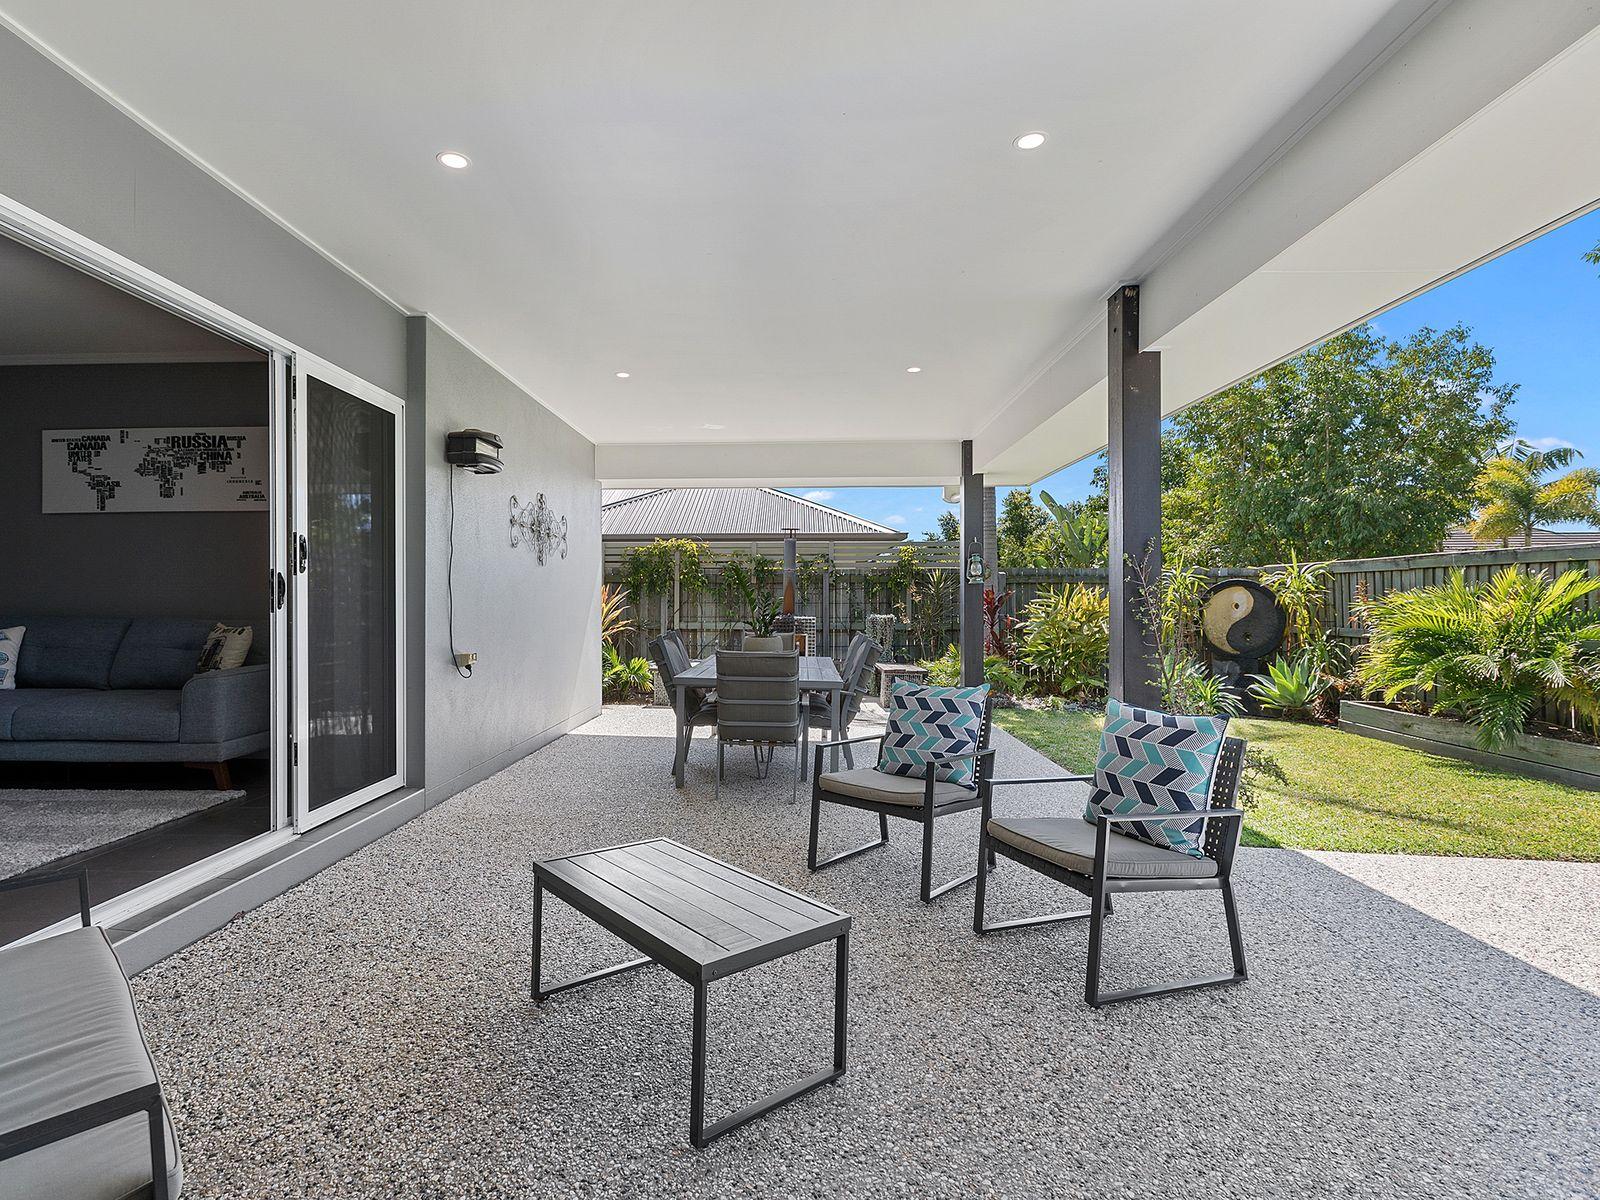 23 Ashburton Crescent, Sippy Downs, QLD 4556